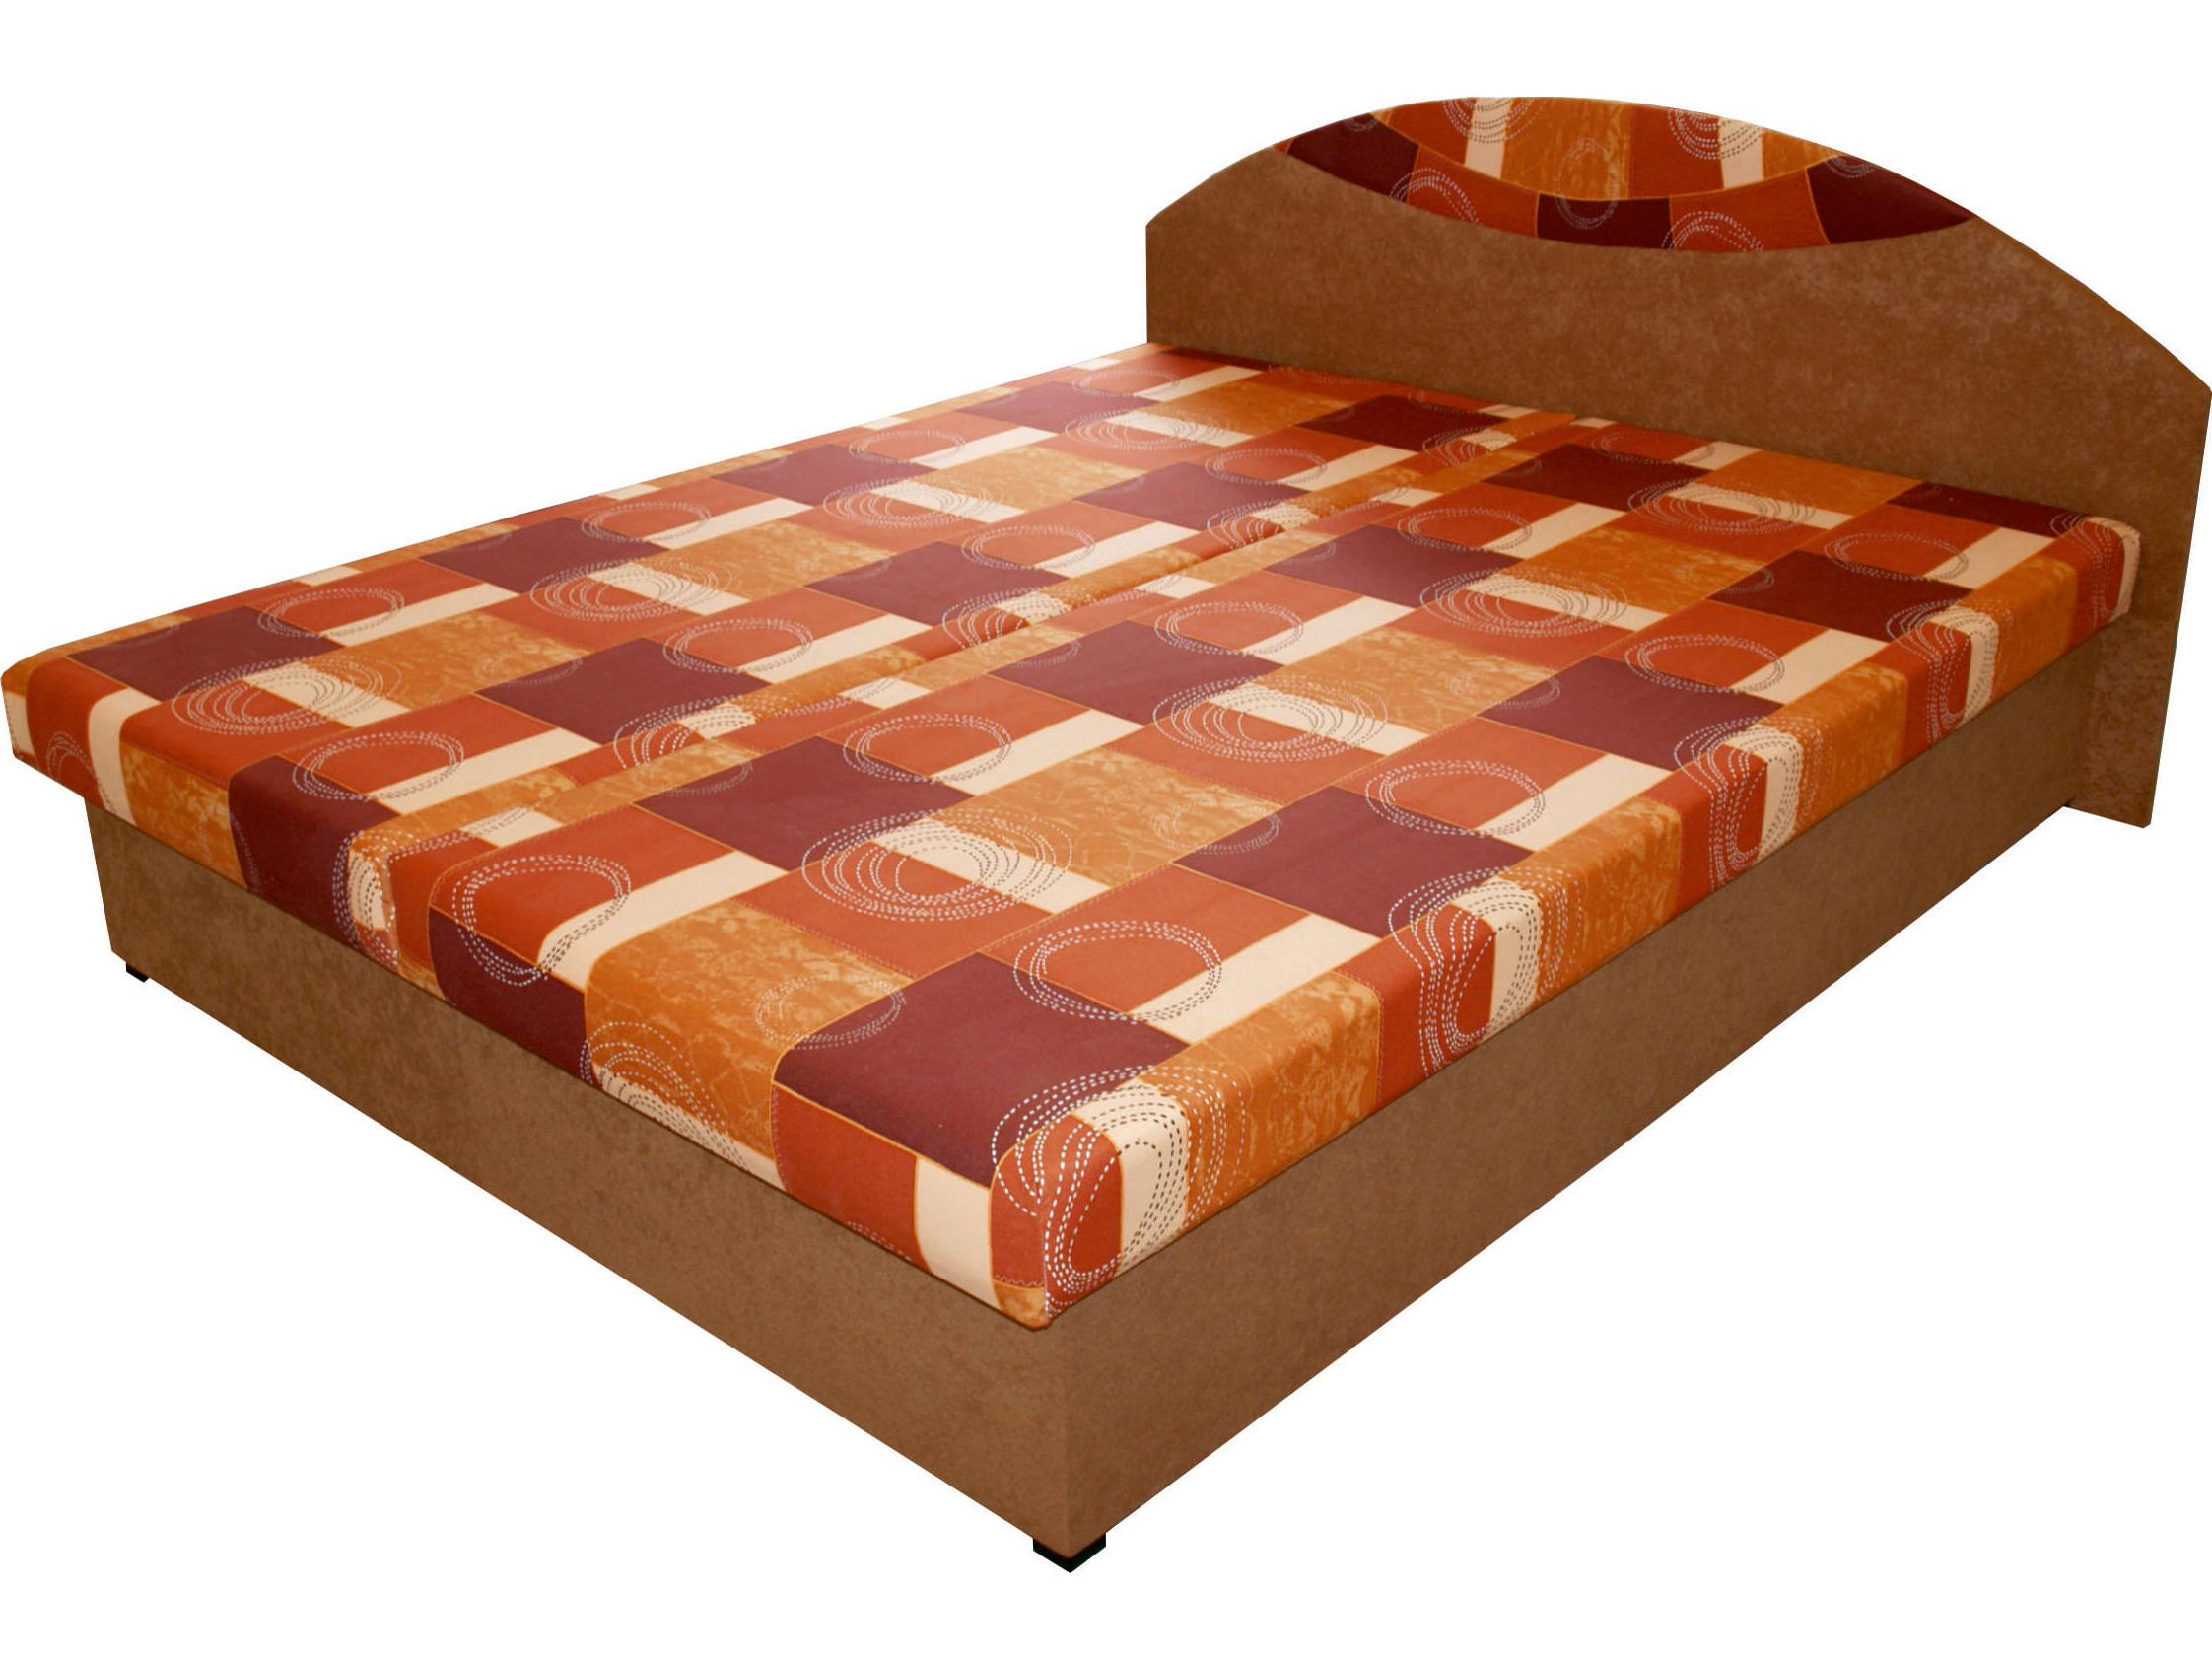 Manželská postel 160 cm - Benab - Dara (s rošty a matracemi)